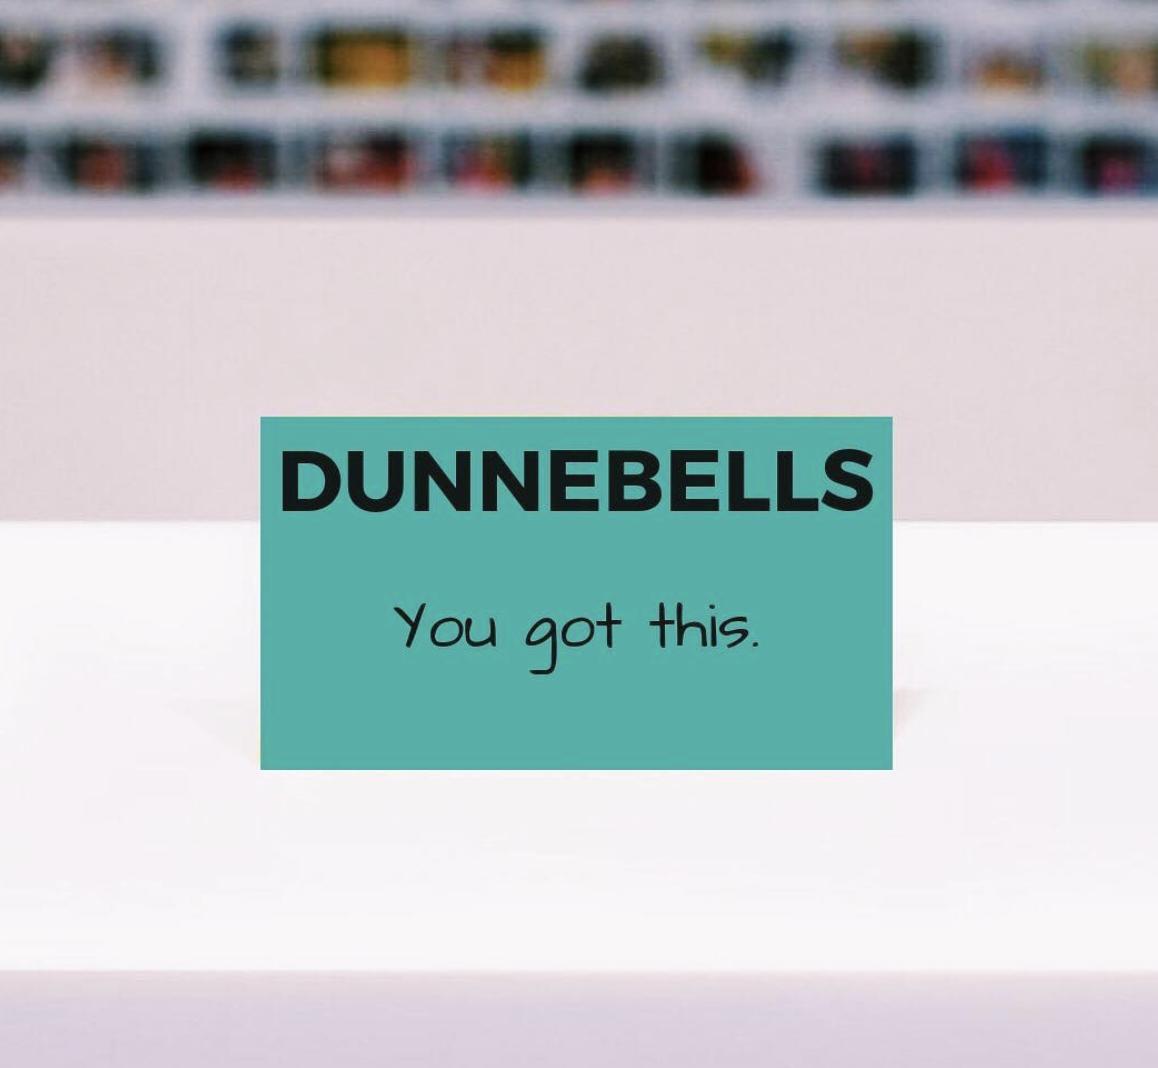 Dunnebells online trainer 1.png